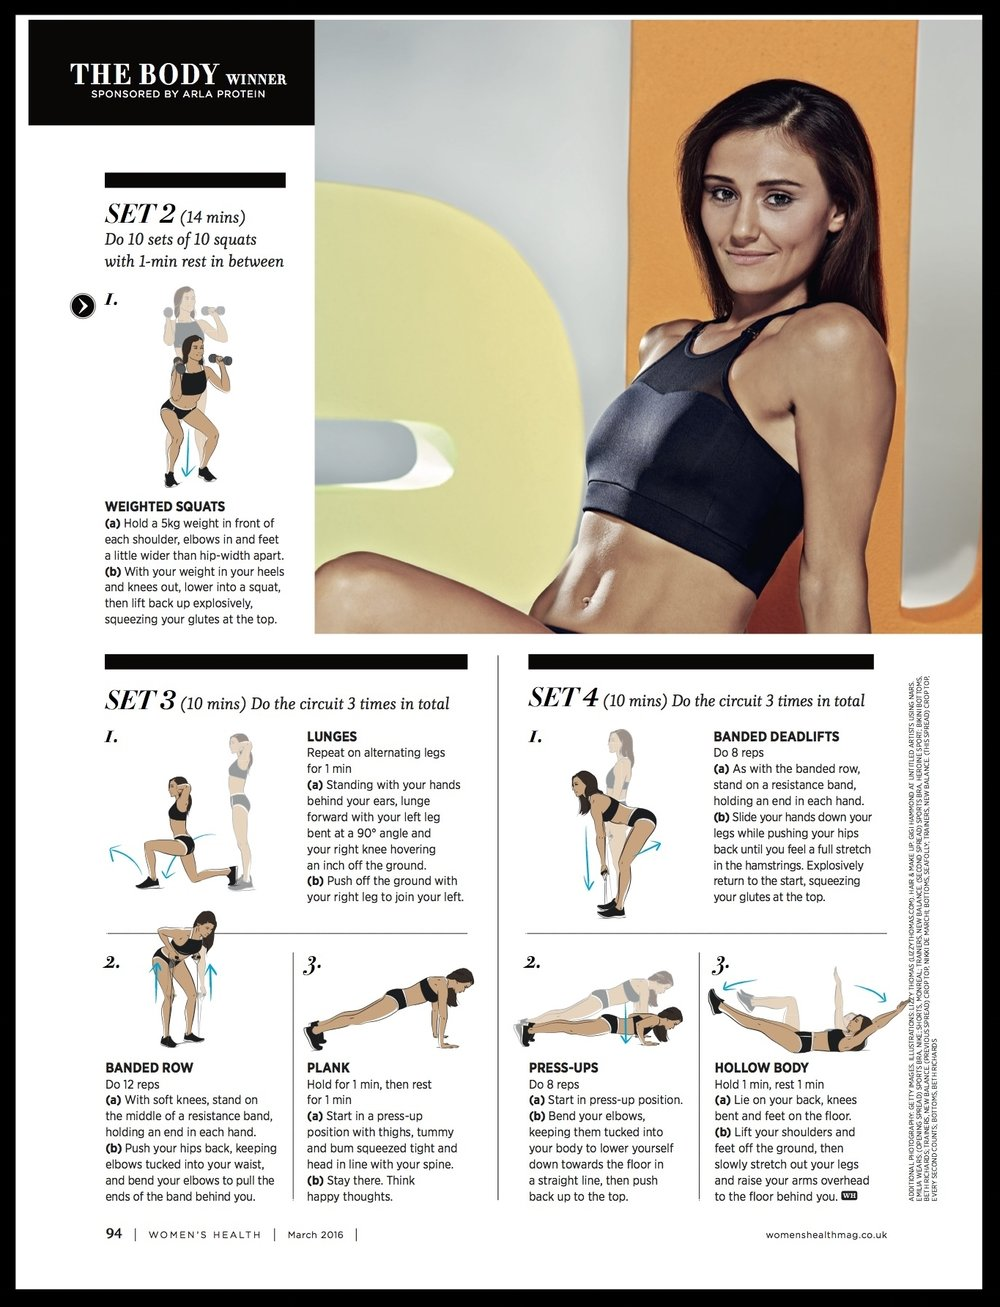 F Body Winner Fitness Plan 7.jpg